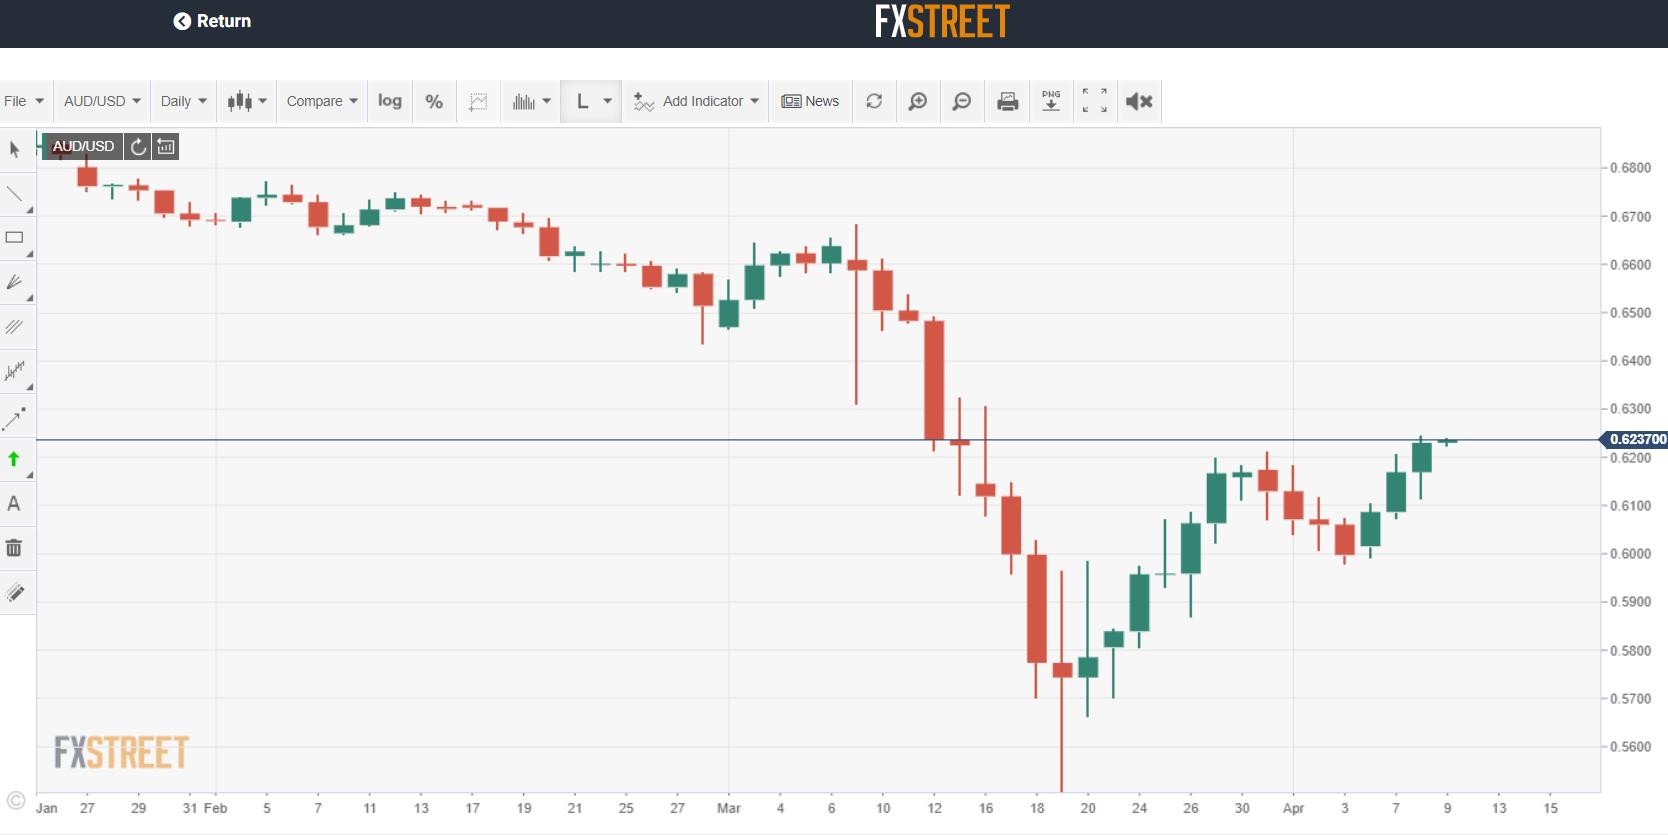 DAILY AUD USD Chart - FX Street - 09 April 2020